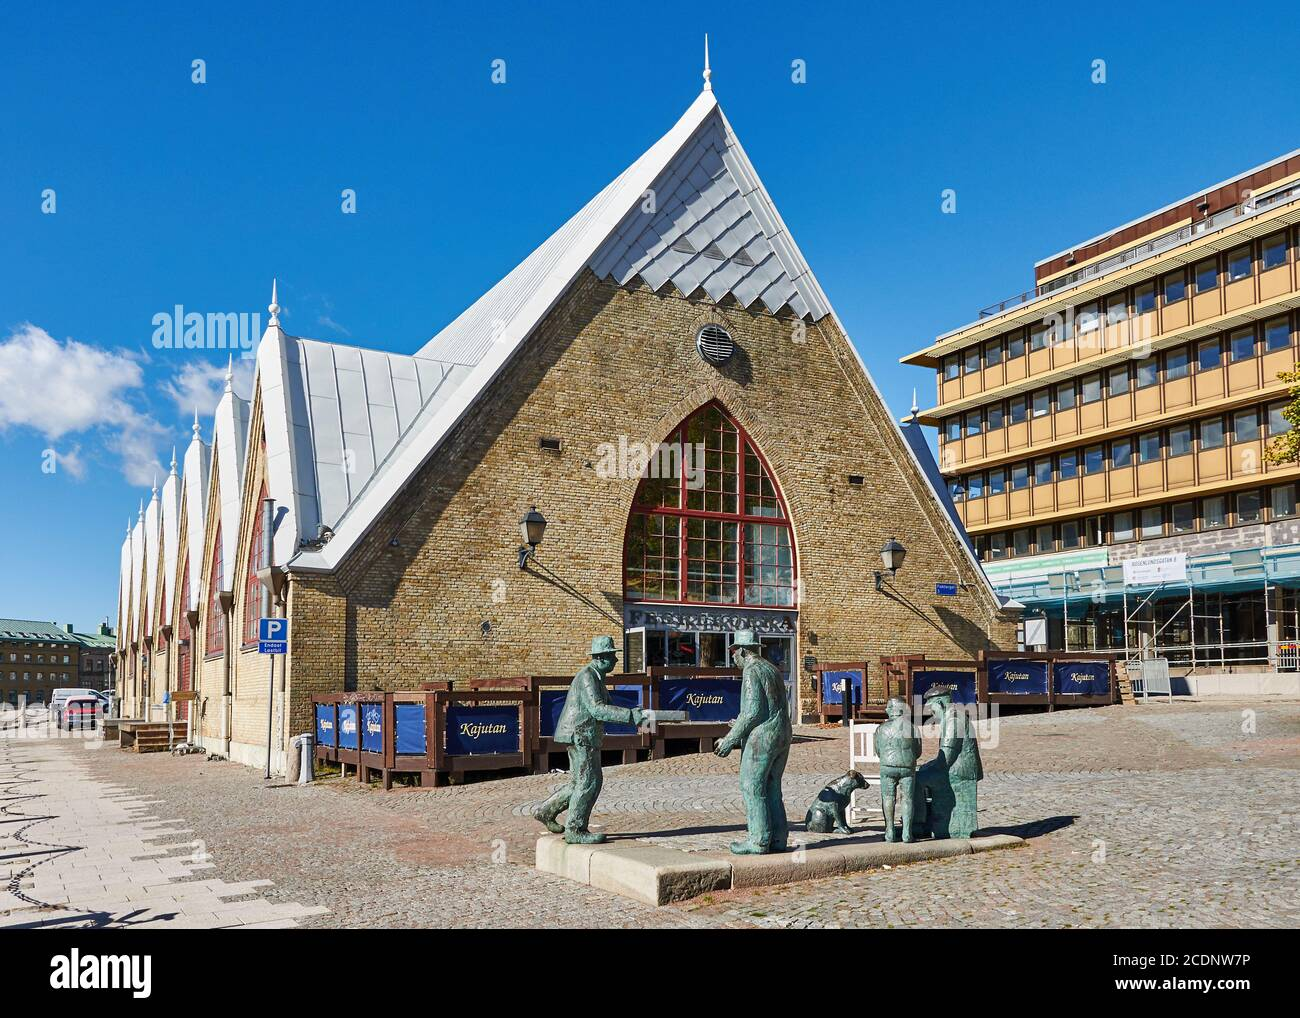 Feskekorka Gothenburg Vastra Gotalands Lan Sweden Stock Photo Alamy